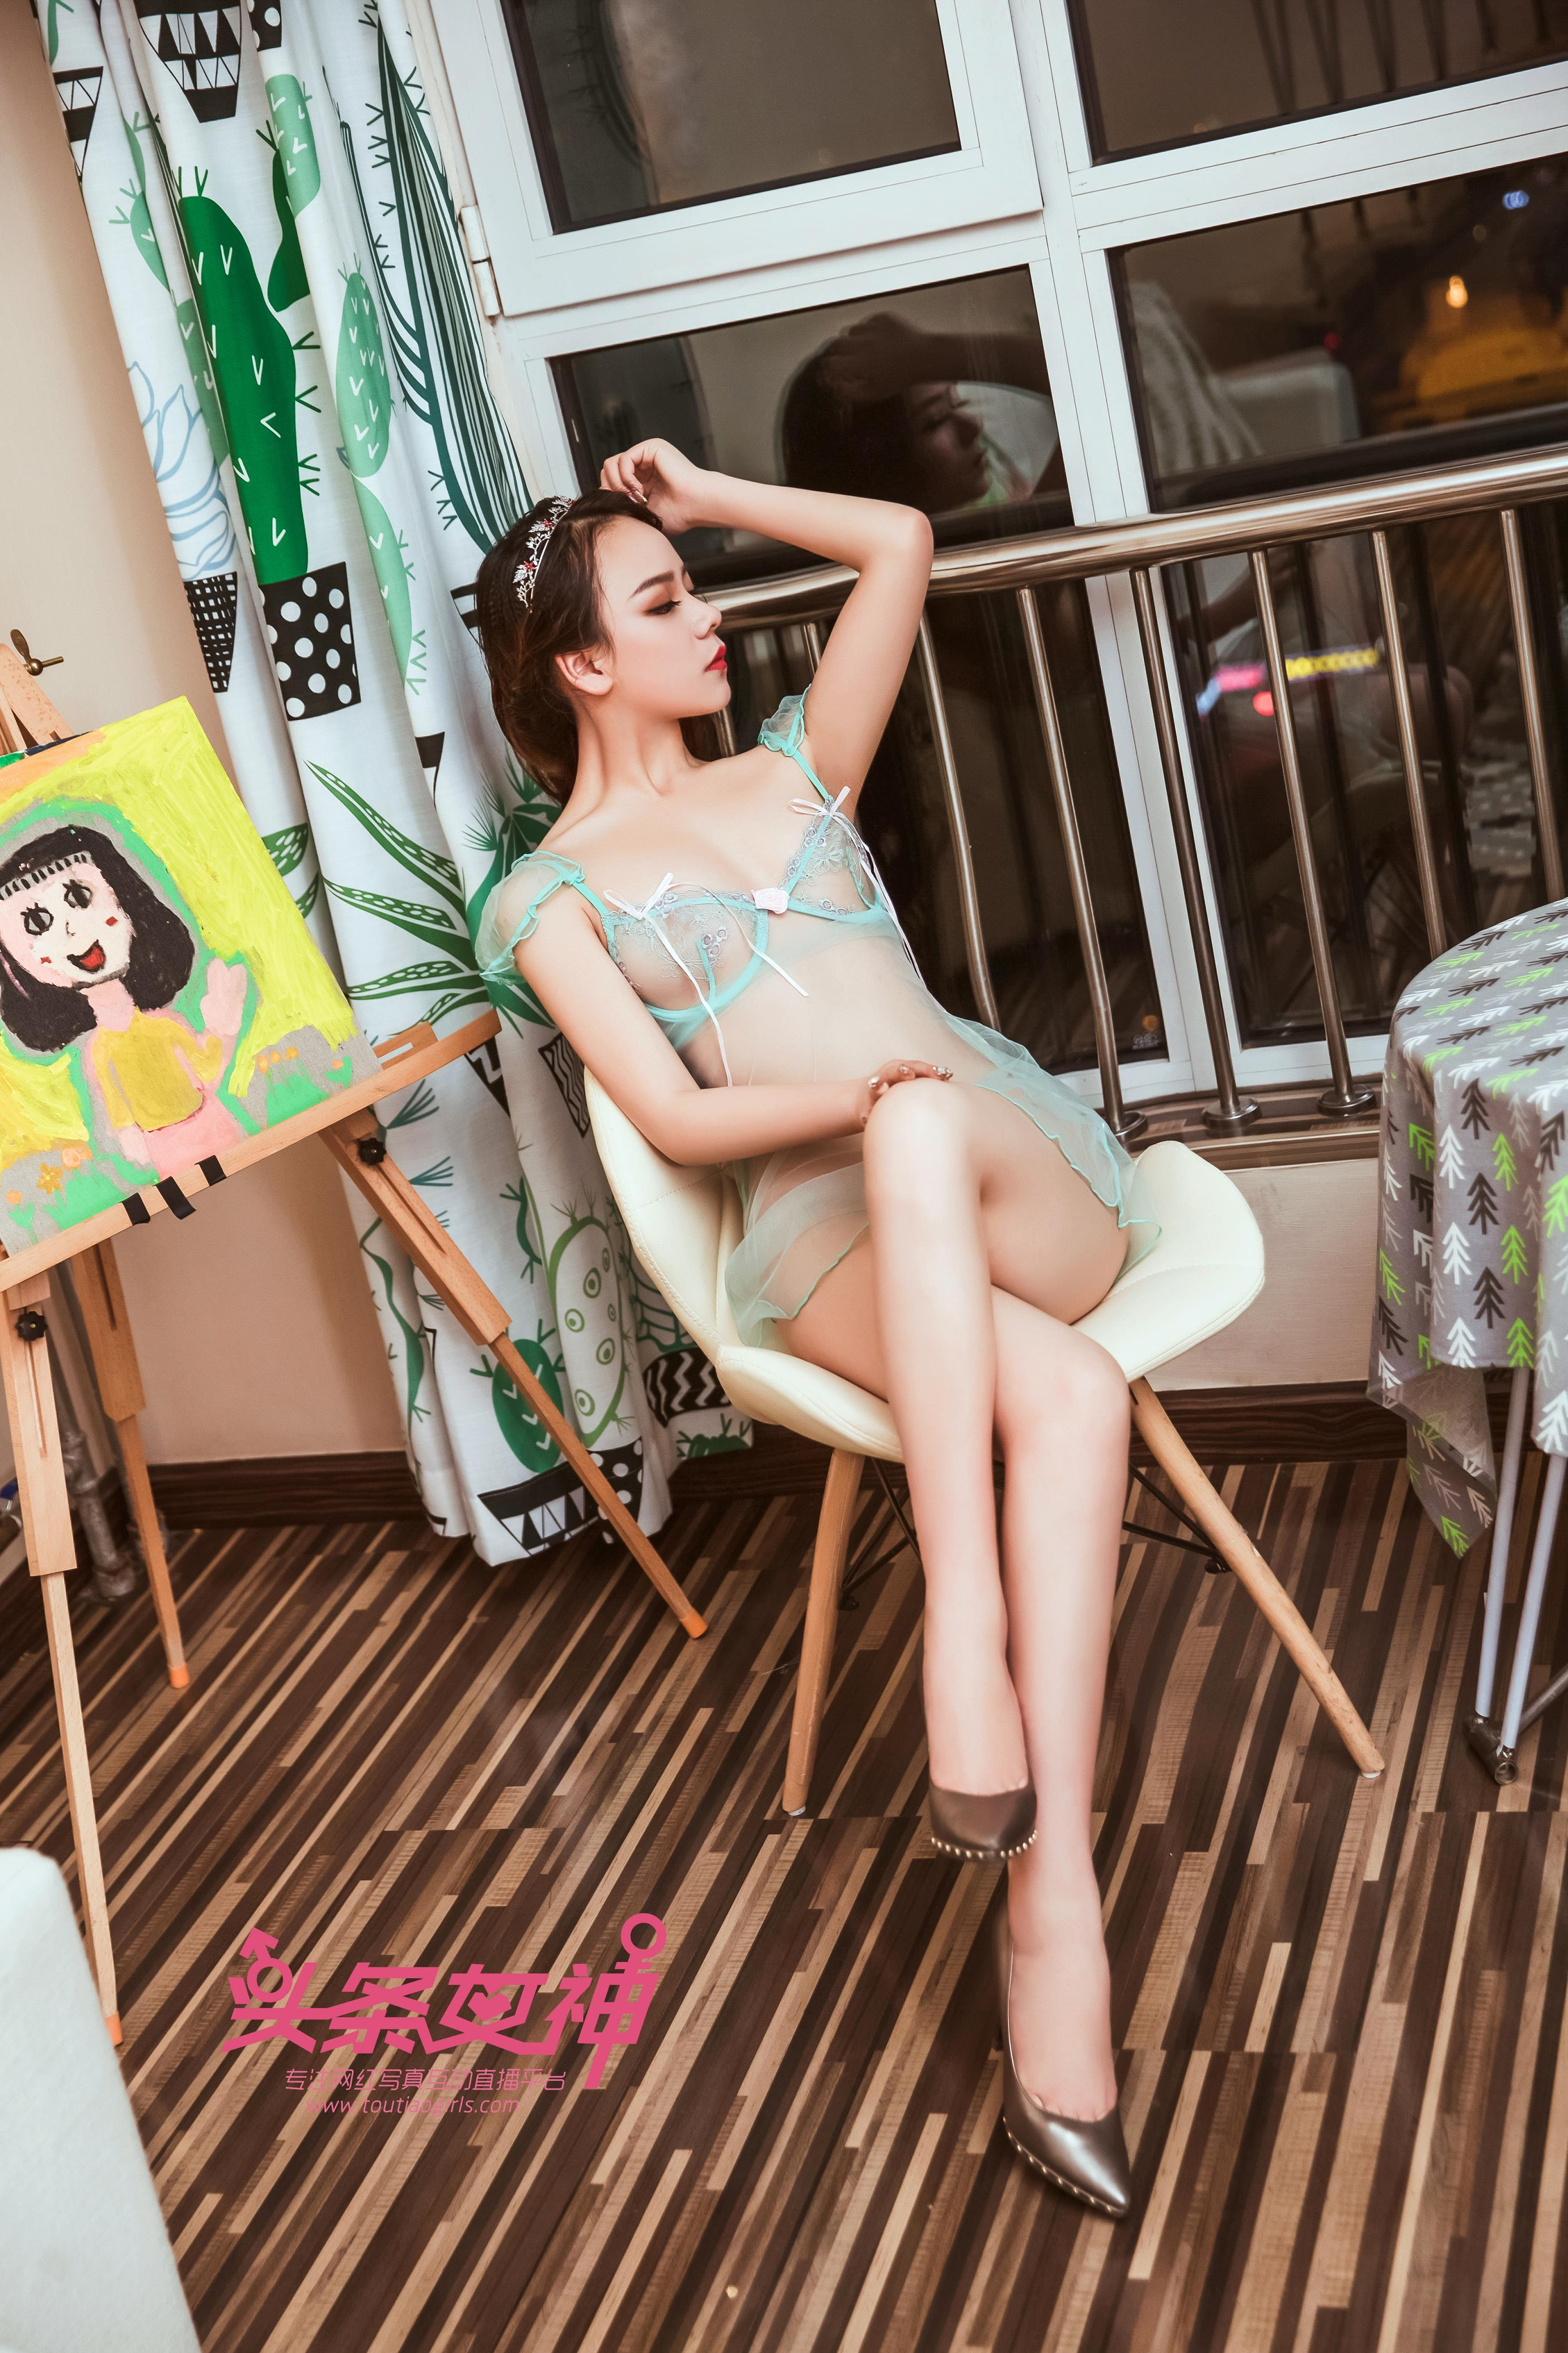 [Toutiaogirls头条女神]2018-05-11 芳草绿纱 子兮 性感透视情趣内衣全裸私房写真集